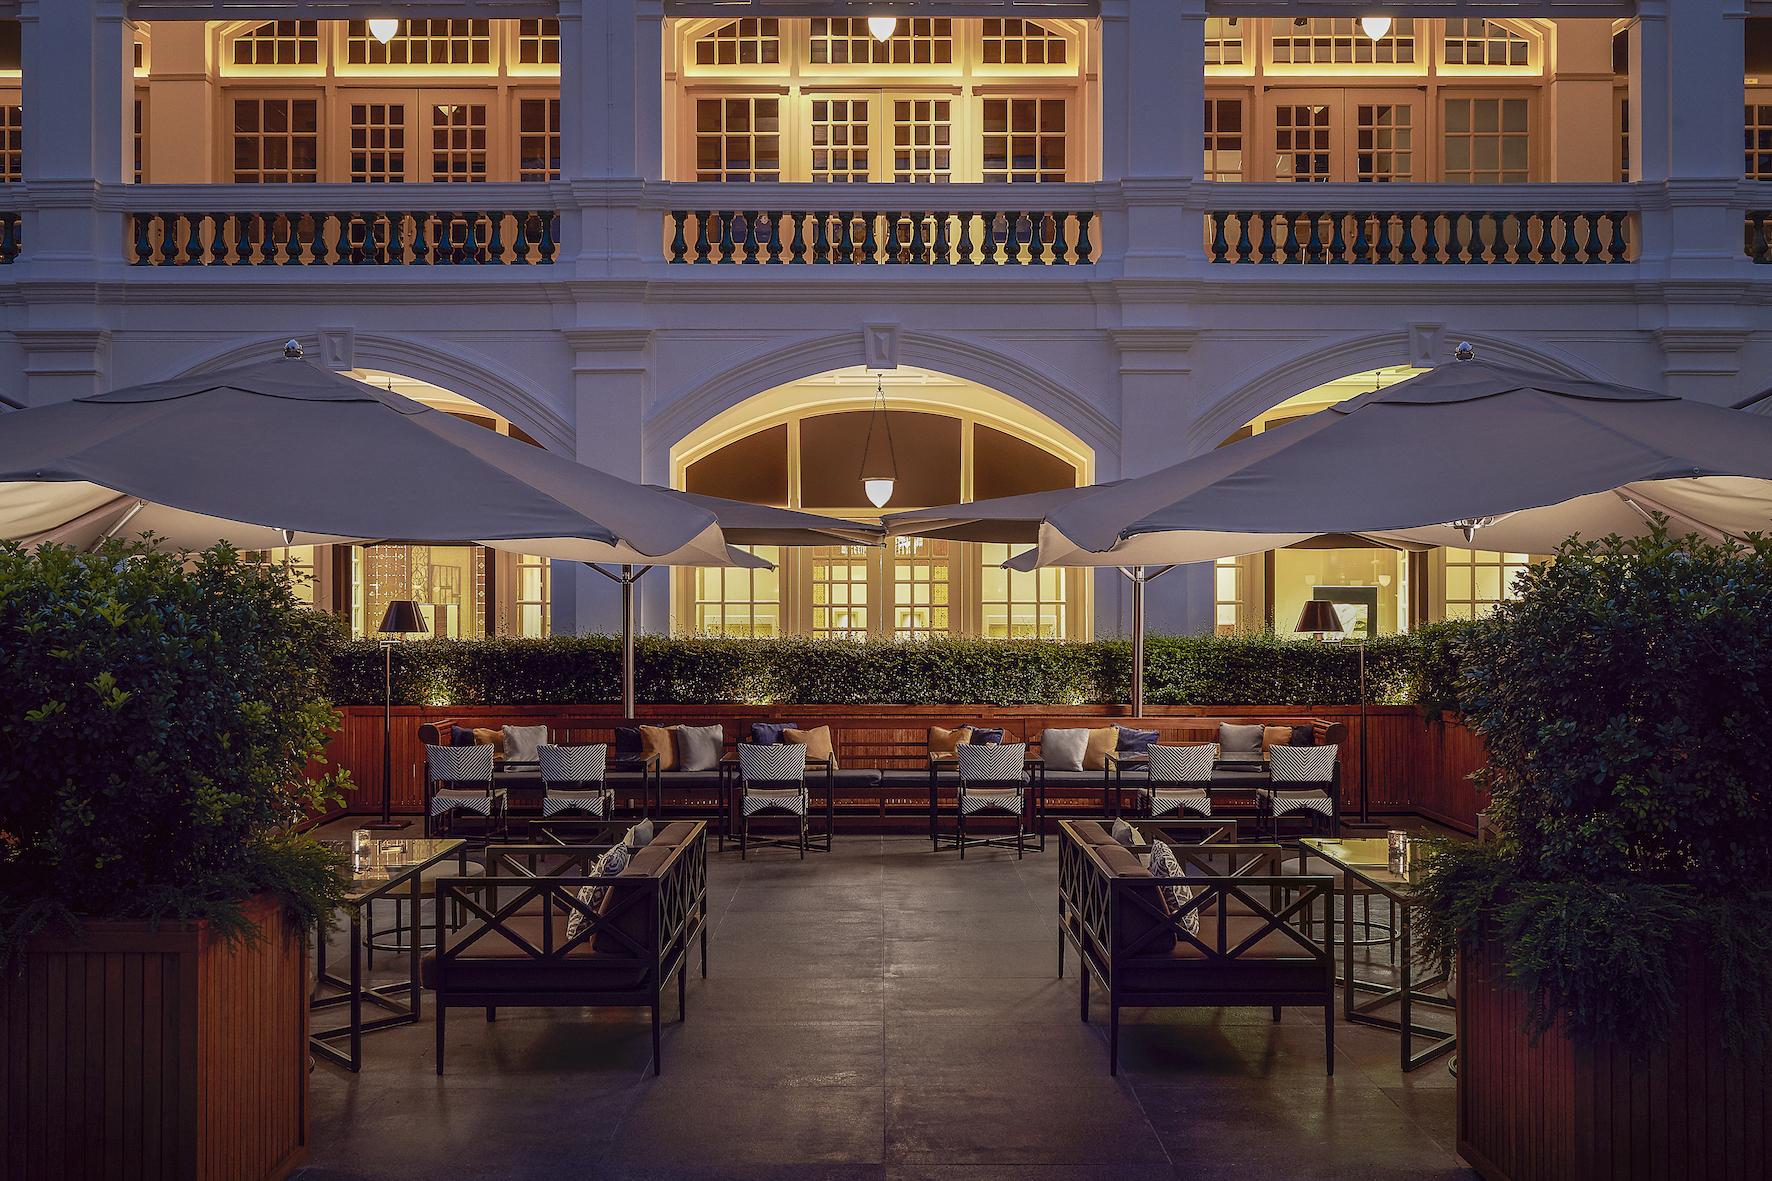 Raffles Courtyard